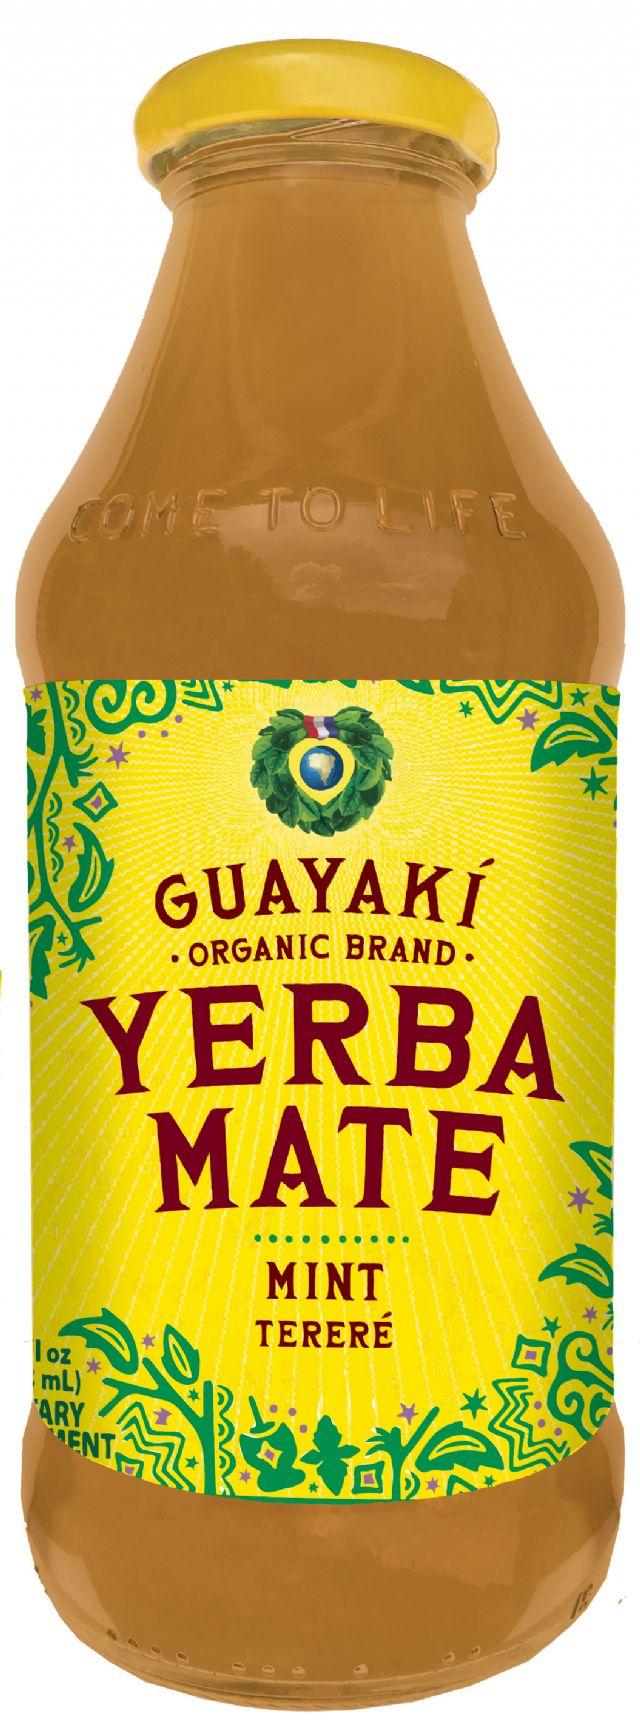 Guayakí Yerba Mate Organic Energy Drink: mint 2015